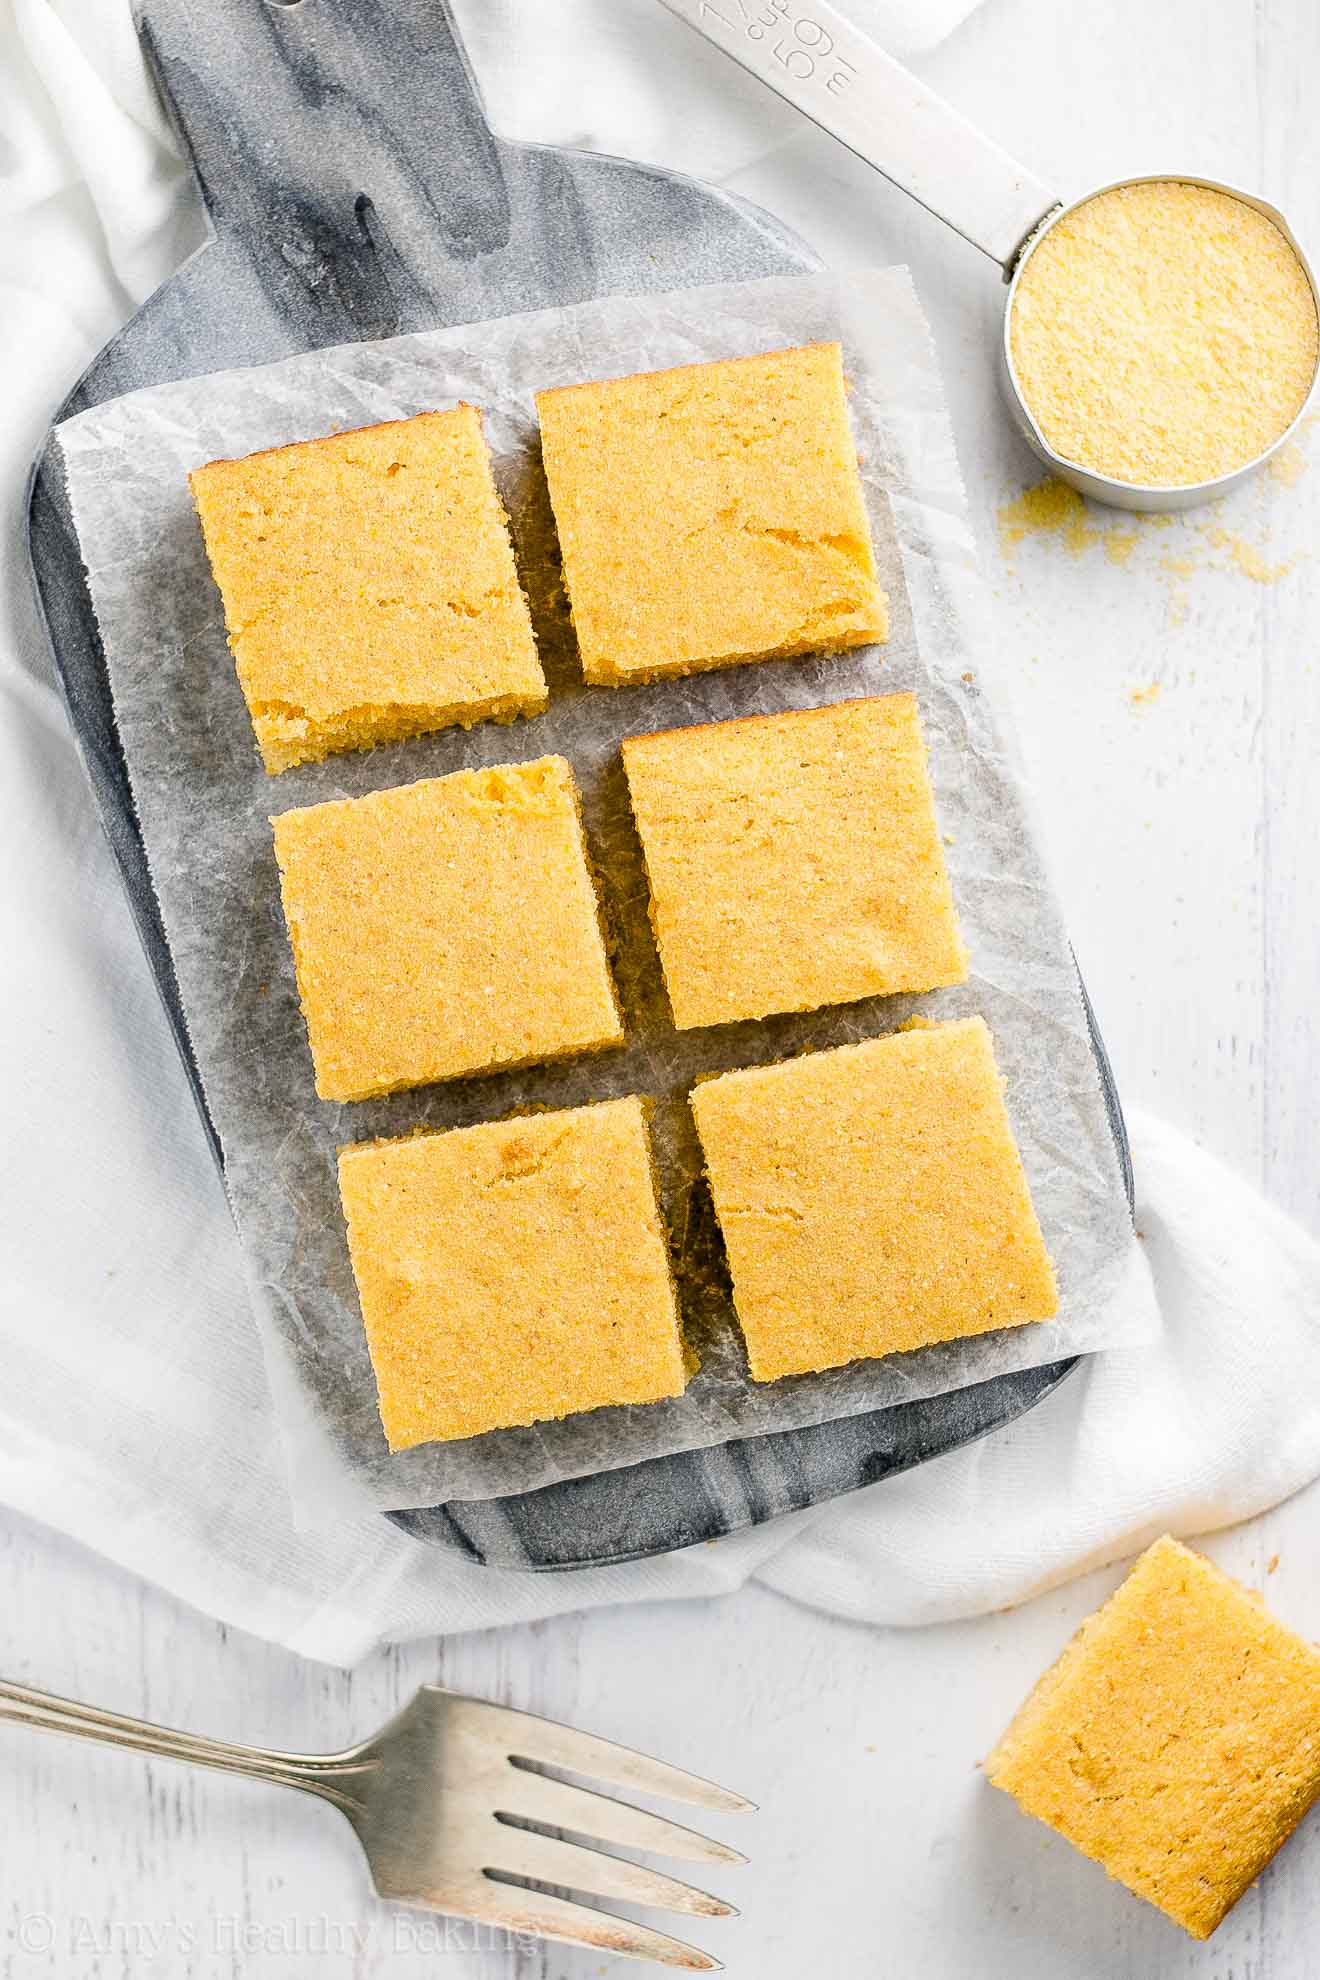 Moist Healthy Buttermilk Cornbread made with whole wheat flour